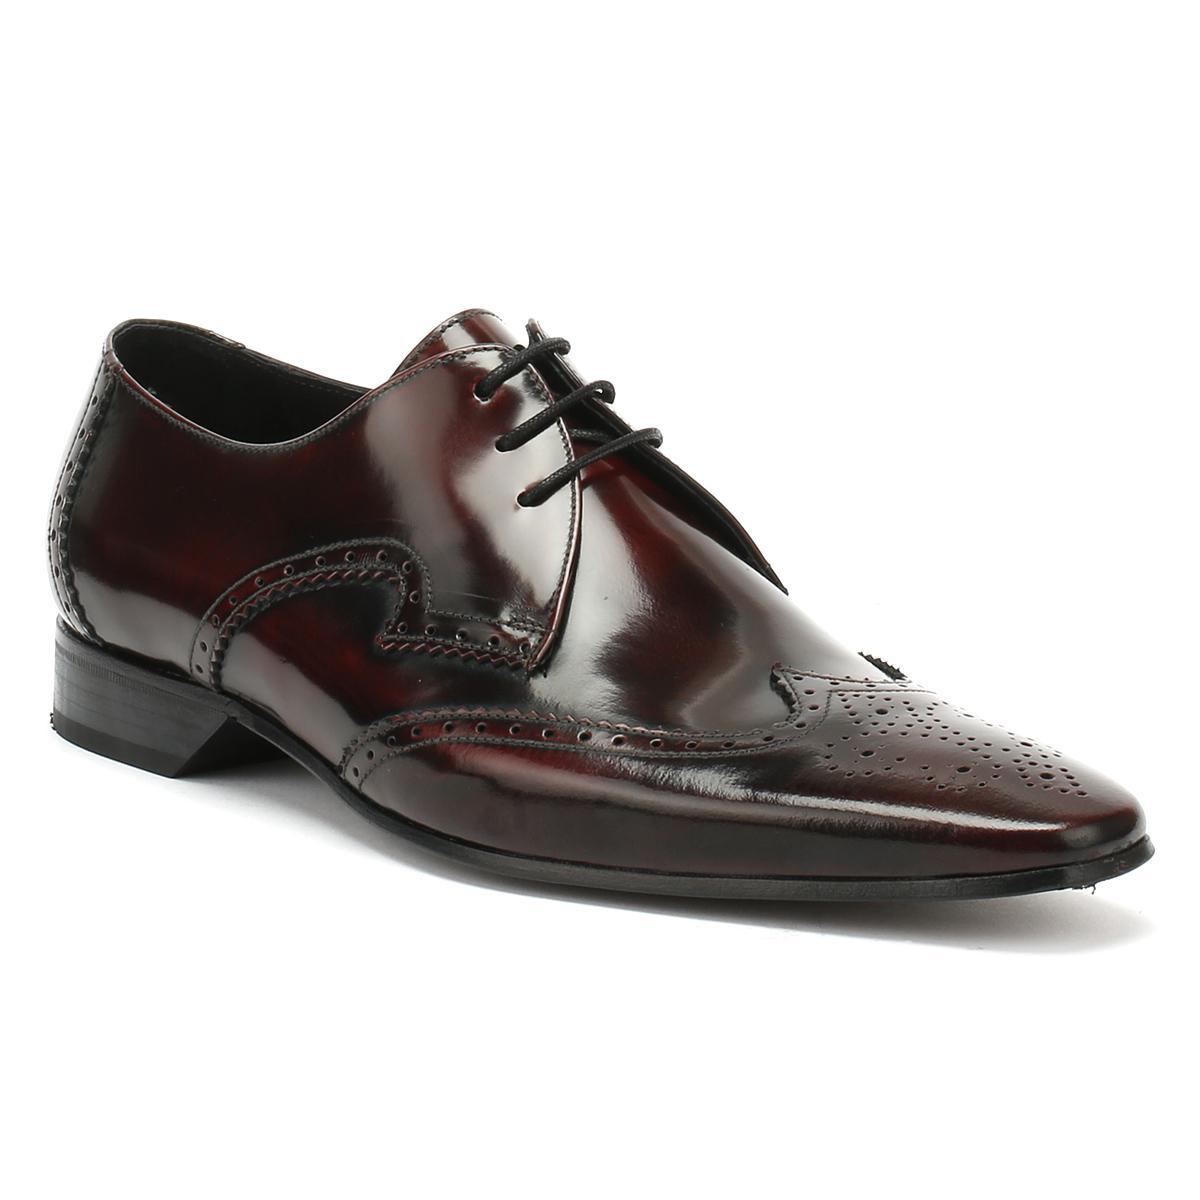 1e61a7f020 Lyst - Jeffery West Mens College Burgundy Escobar Brogue Derby Shoes ...